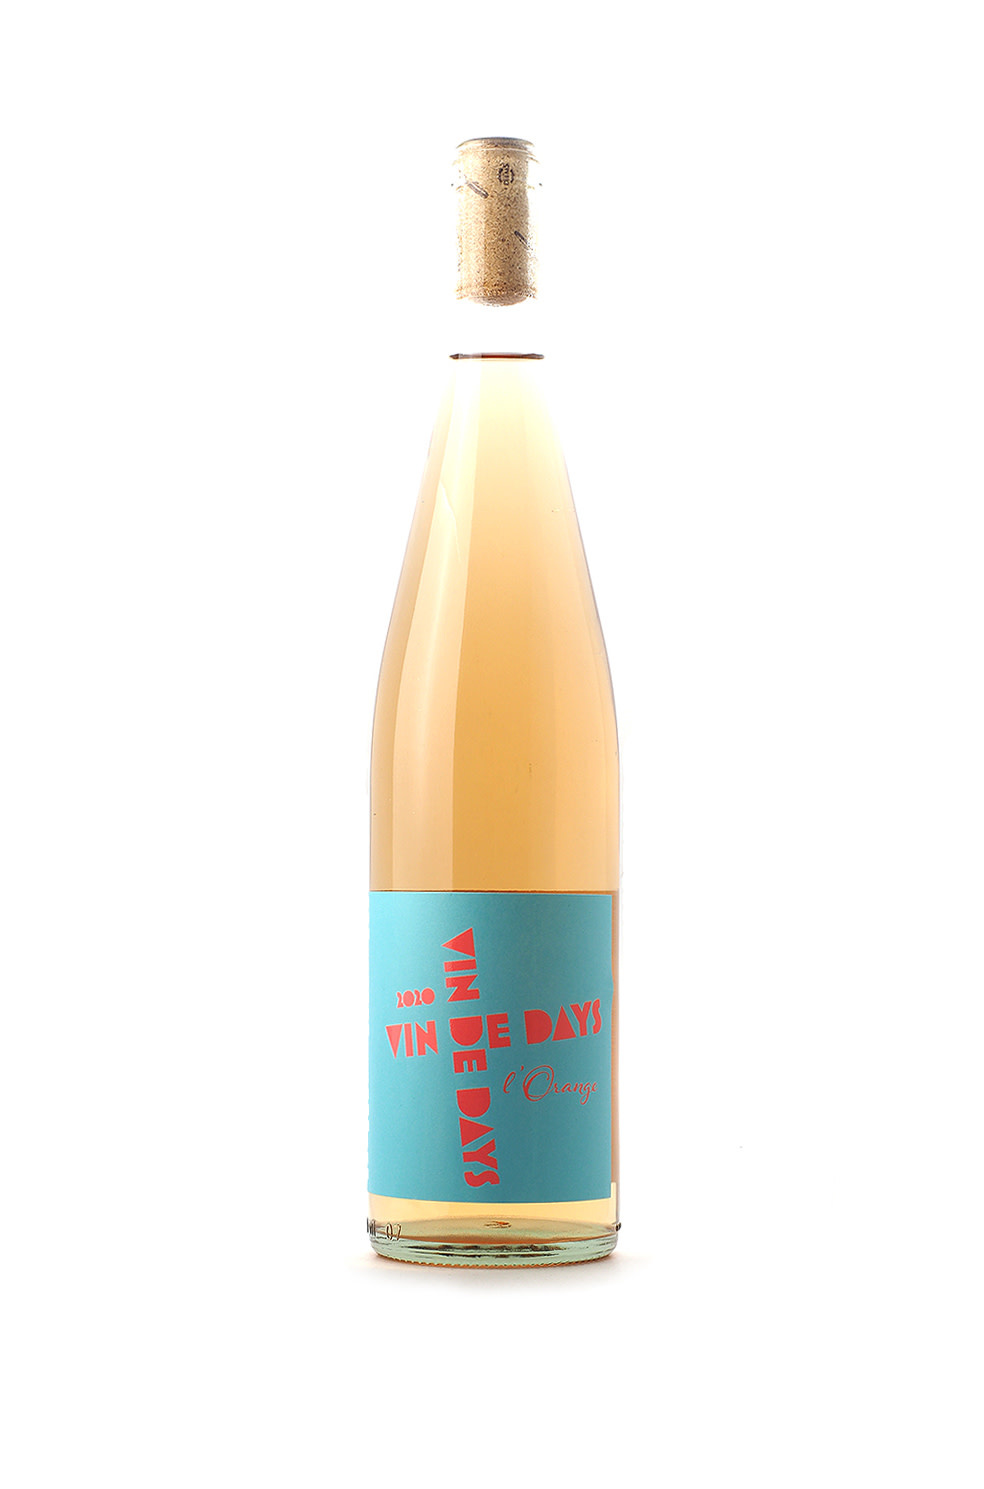 Day Wines Vin de Days L'Orange 2020